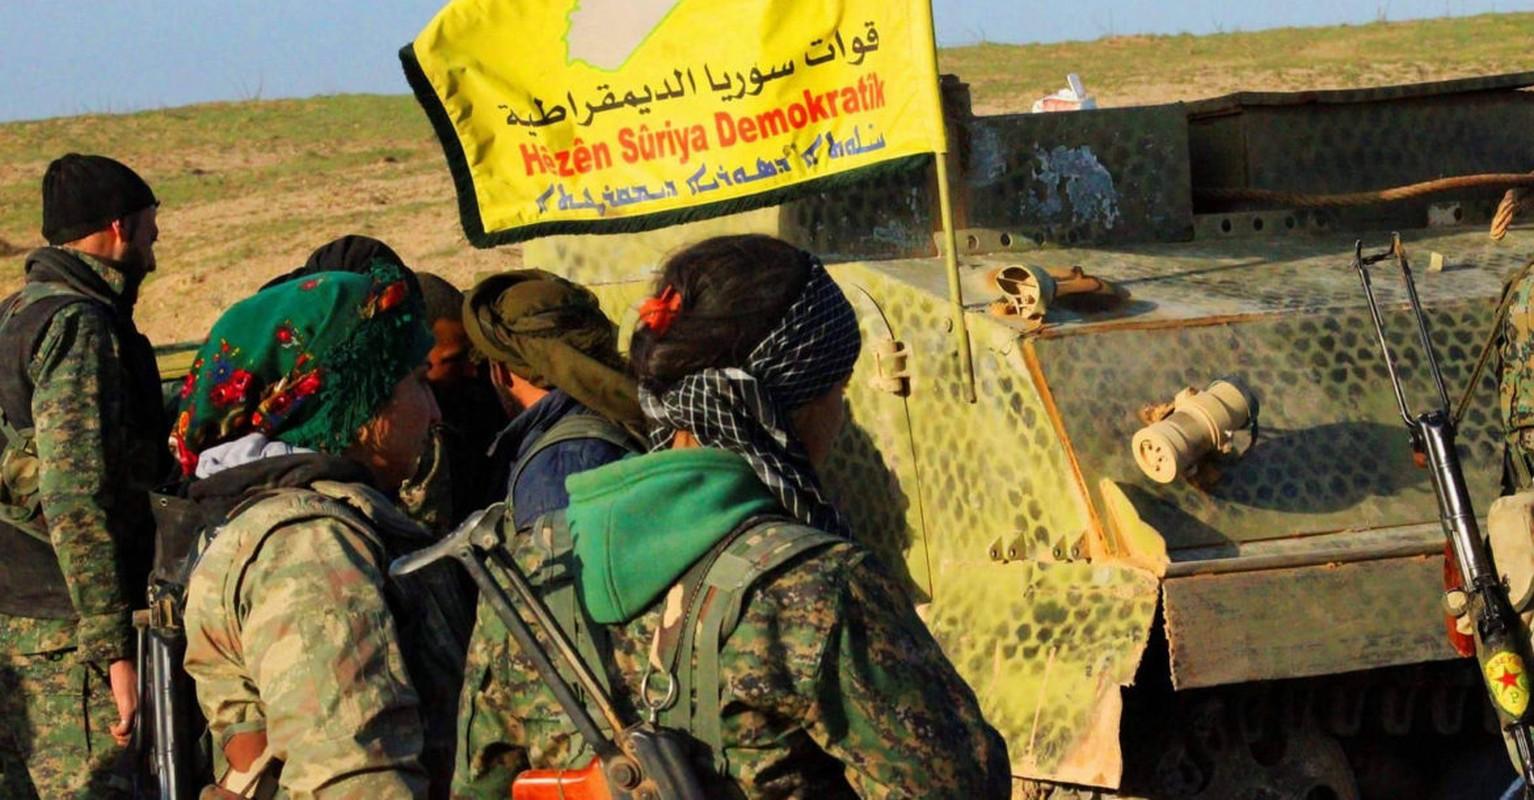 SDF chiem vung chien luoc tai Deir Ezzor, IS phan cong trong vo vong-Hinh-8